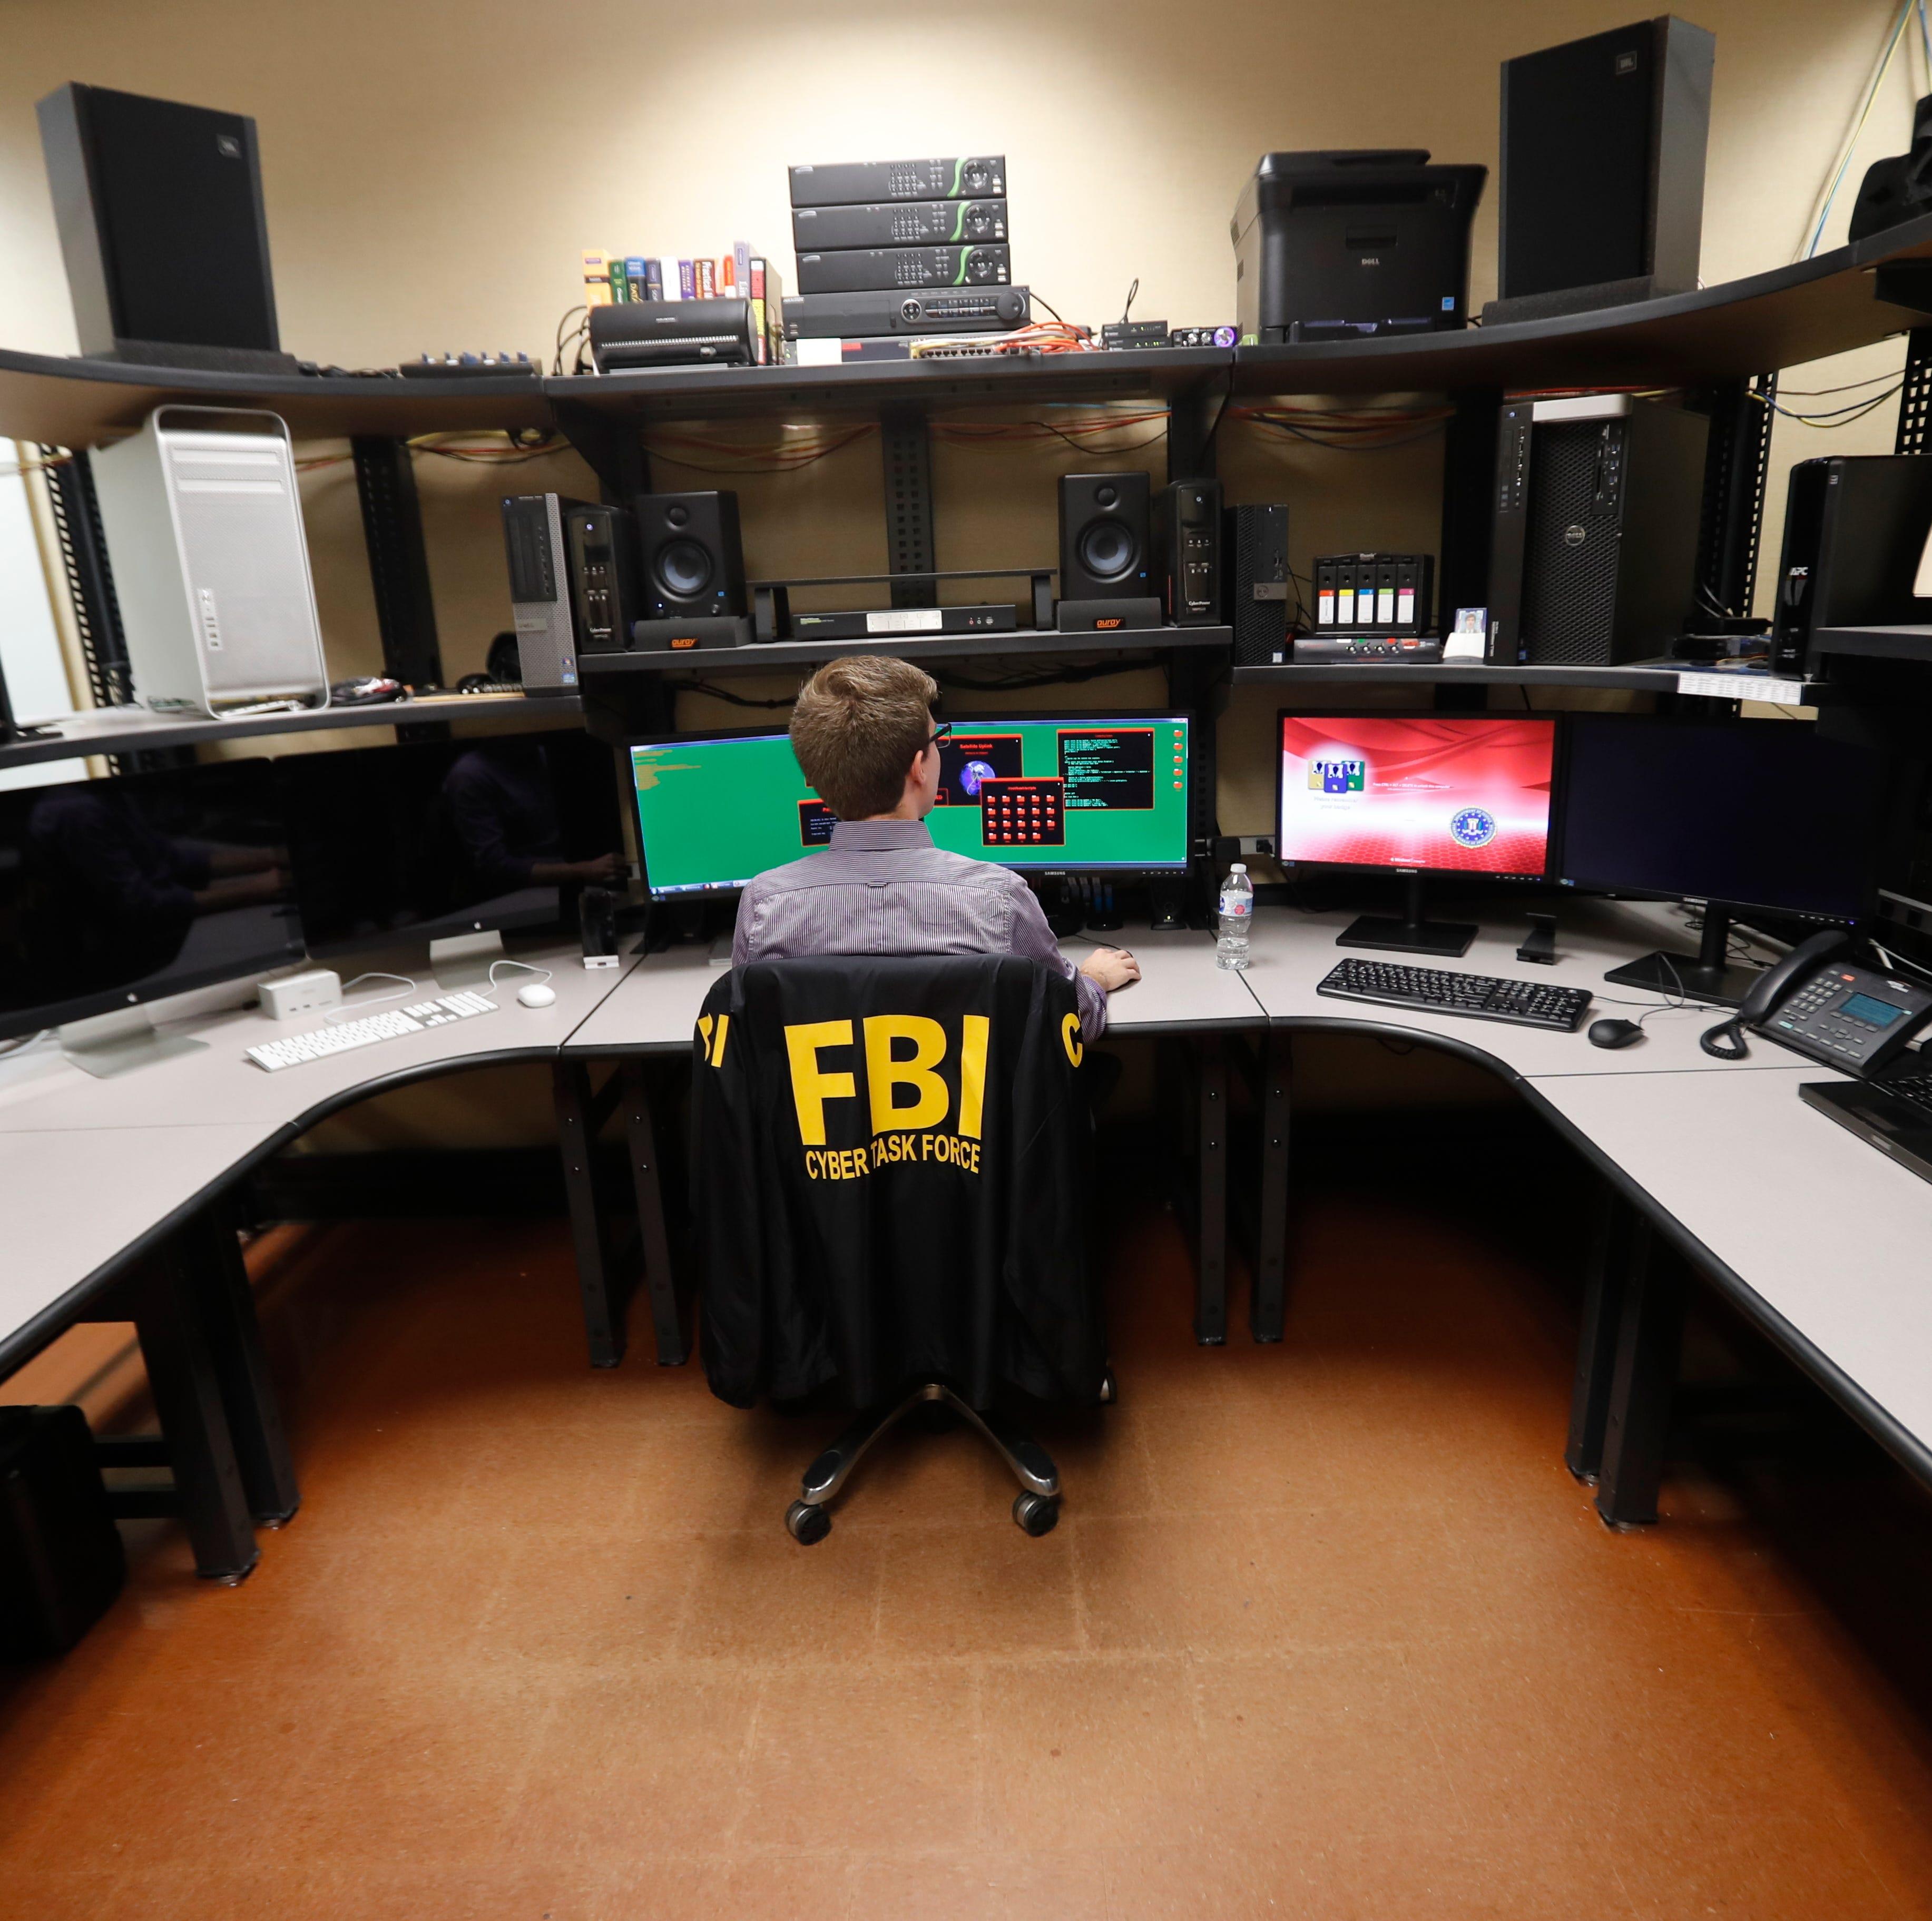 FBI agent: 'Louisiana is a major cyber vulnerability area'